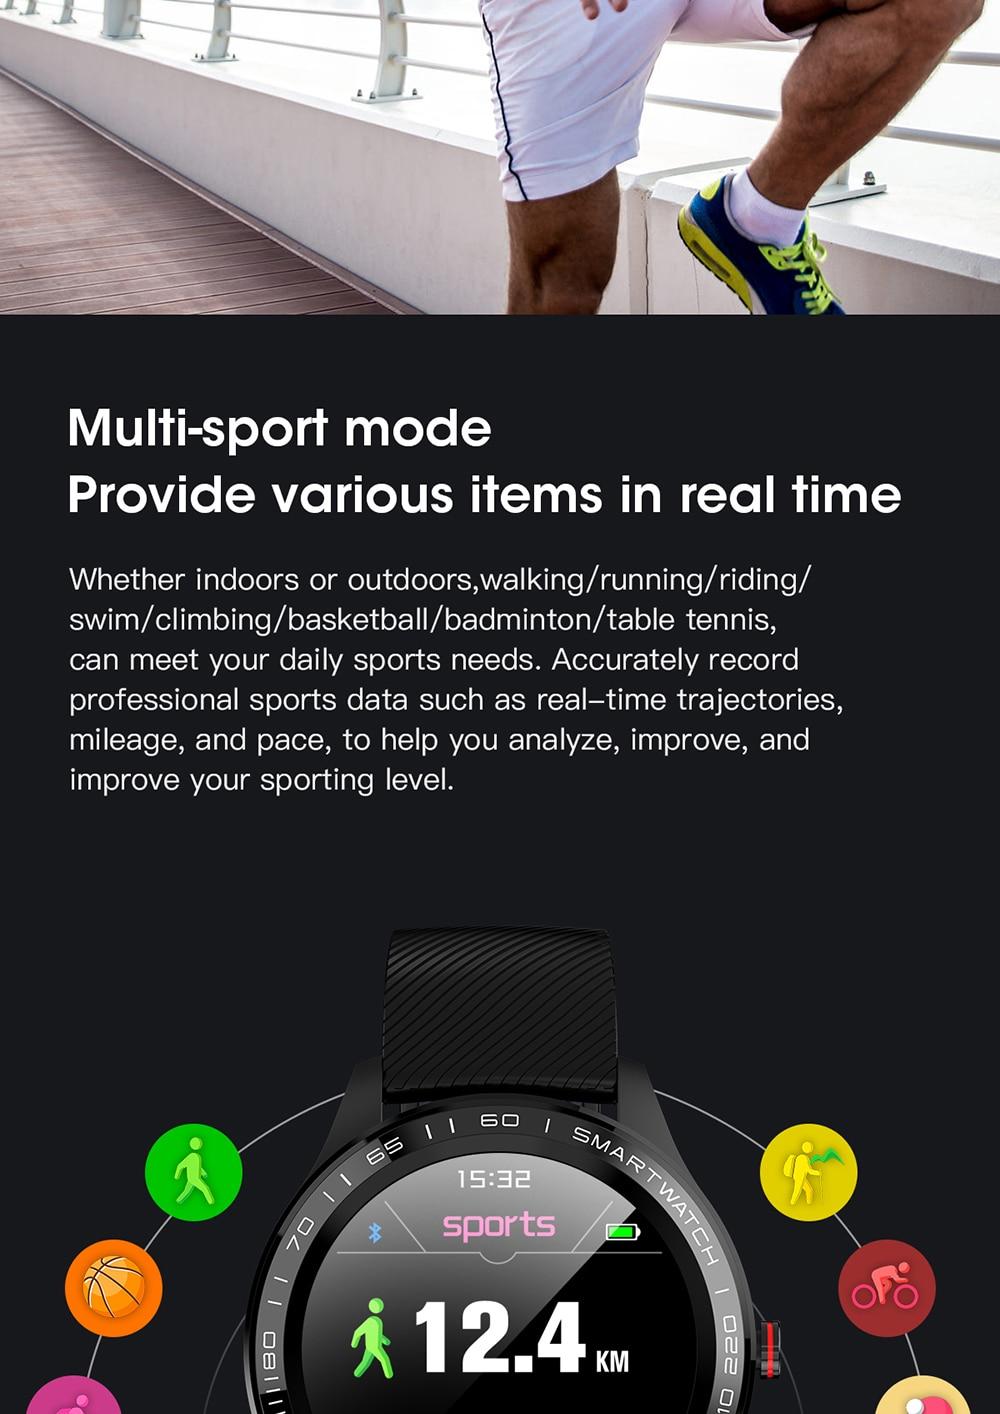 Hc027bed8ccfa47da83668f1d787049fbS 696 L9 Full touch Smart Watch Men ECG+PPG Heart Rate Blood Pressure oxygen Monitor IP68 Waterproof Bluetooth Smart Bracelet